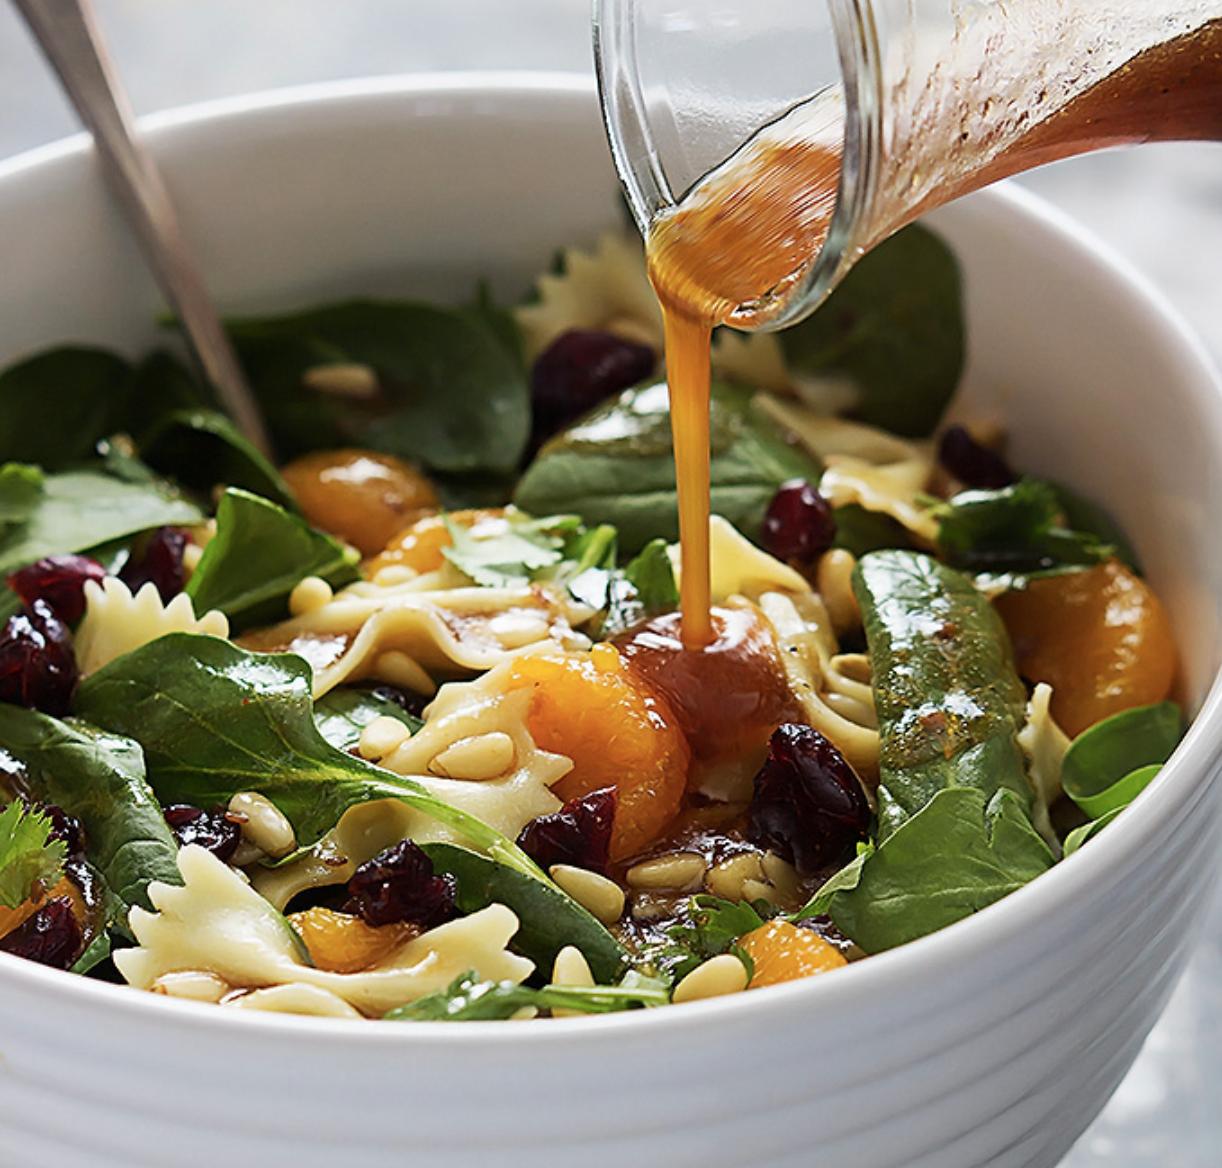 pasta salad no microwave or fridge